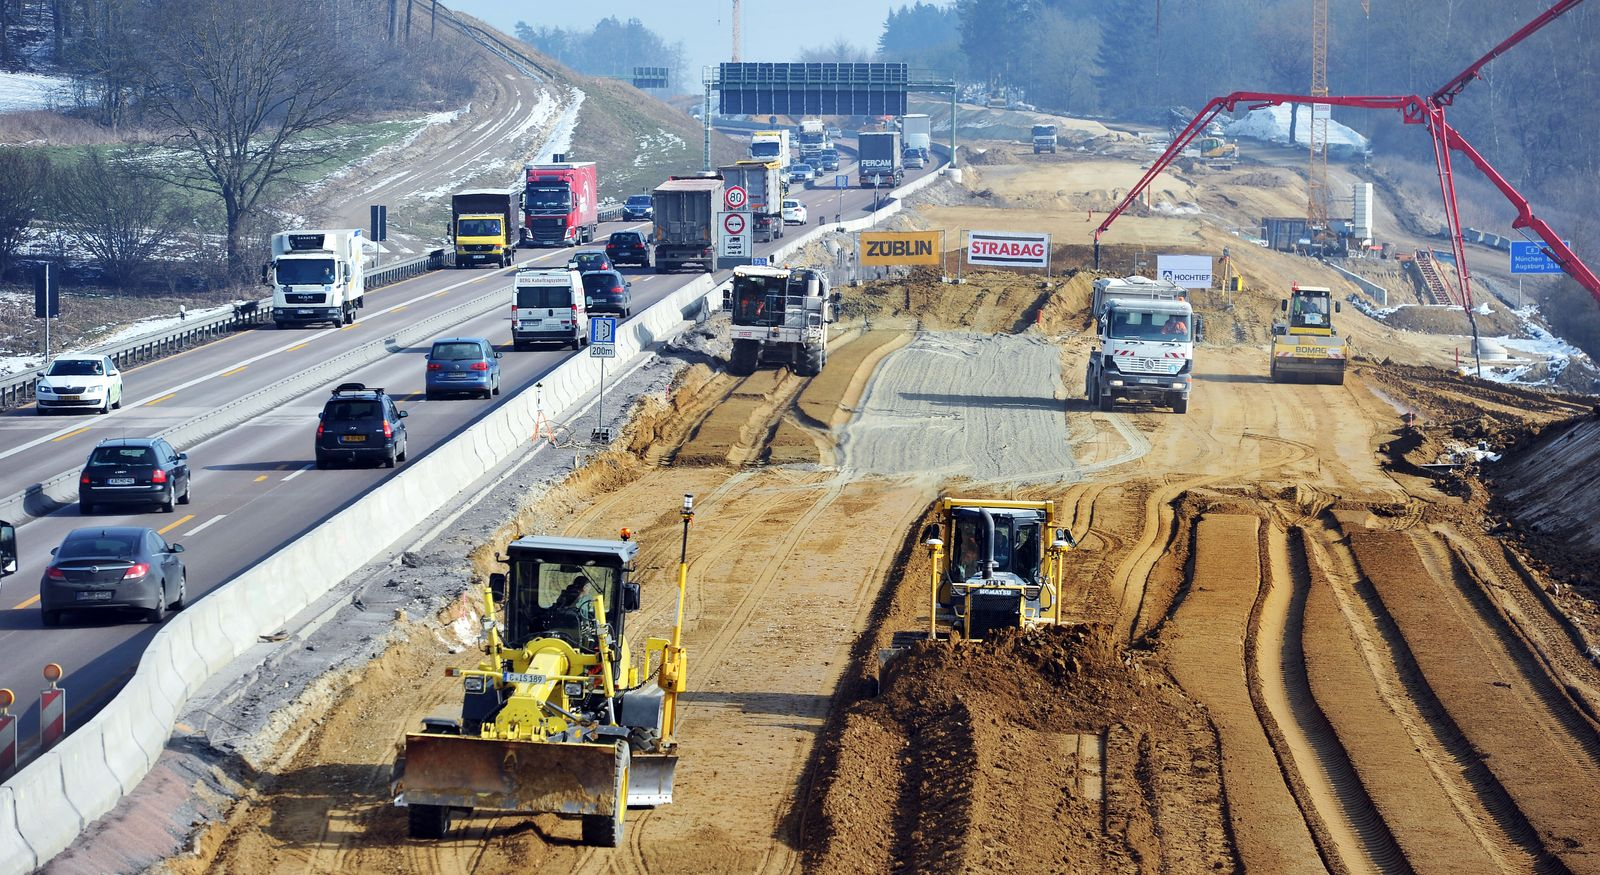 Autobahn / Baustelle / Bundesverkehrswegeplan / A8